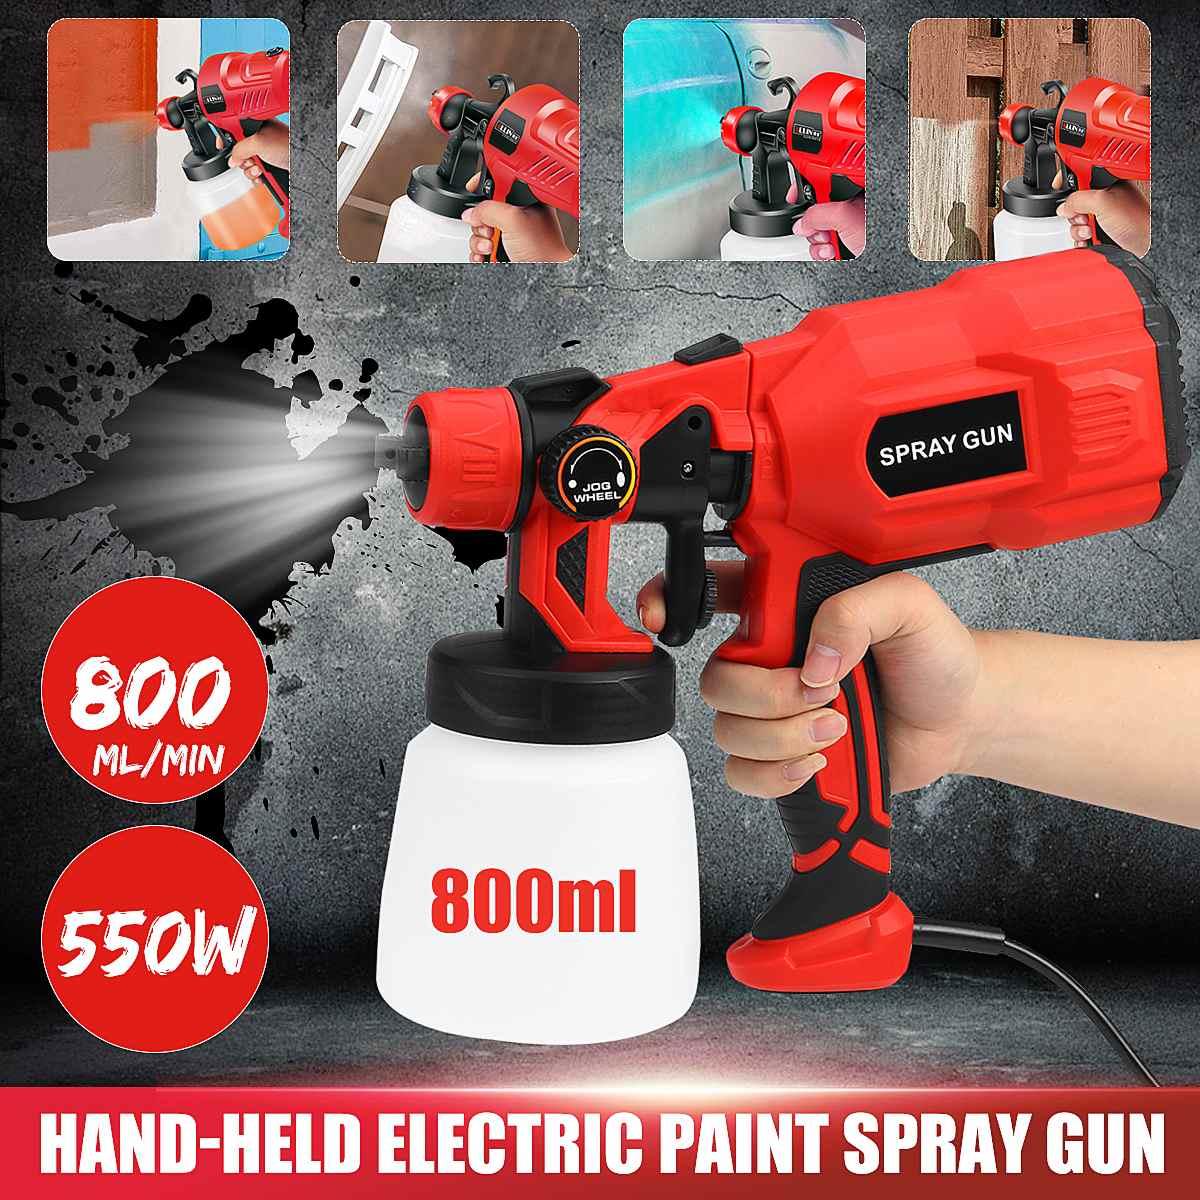 1.8mm 550 w pistola de pulverizador pintura 220 v 800 ml de alta potência pistolas para pintura limpeza pesticidas hvlp pulverizador elétrico pintura pulverização